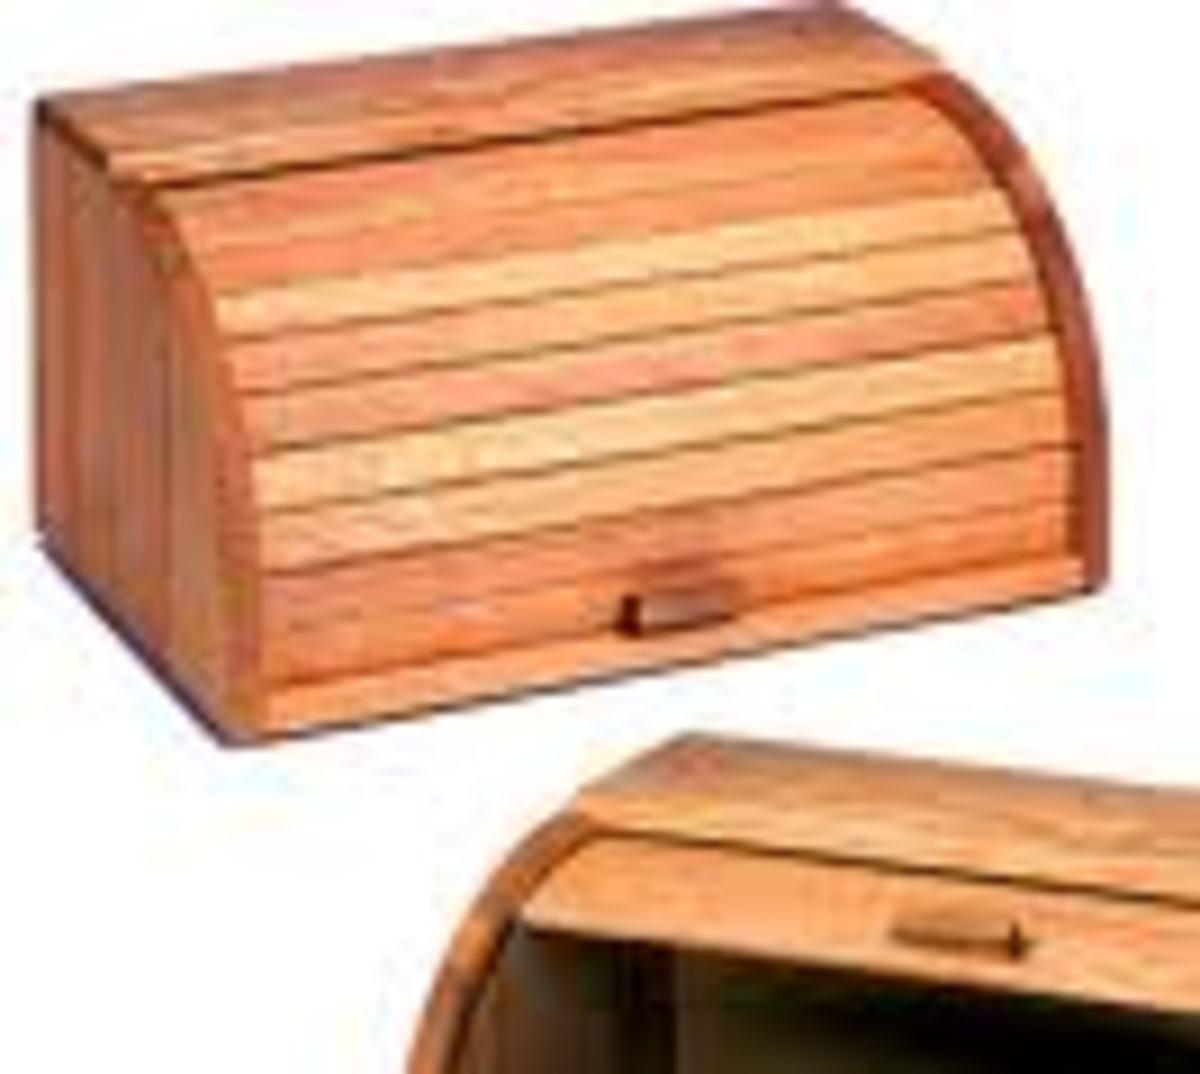 Breadbox with tambour.